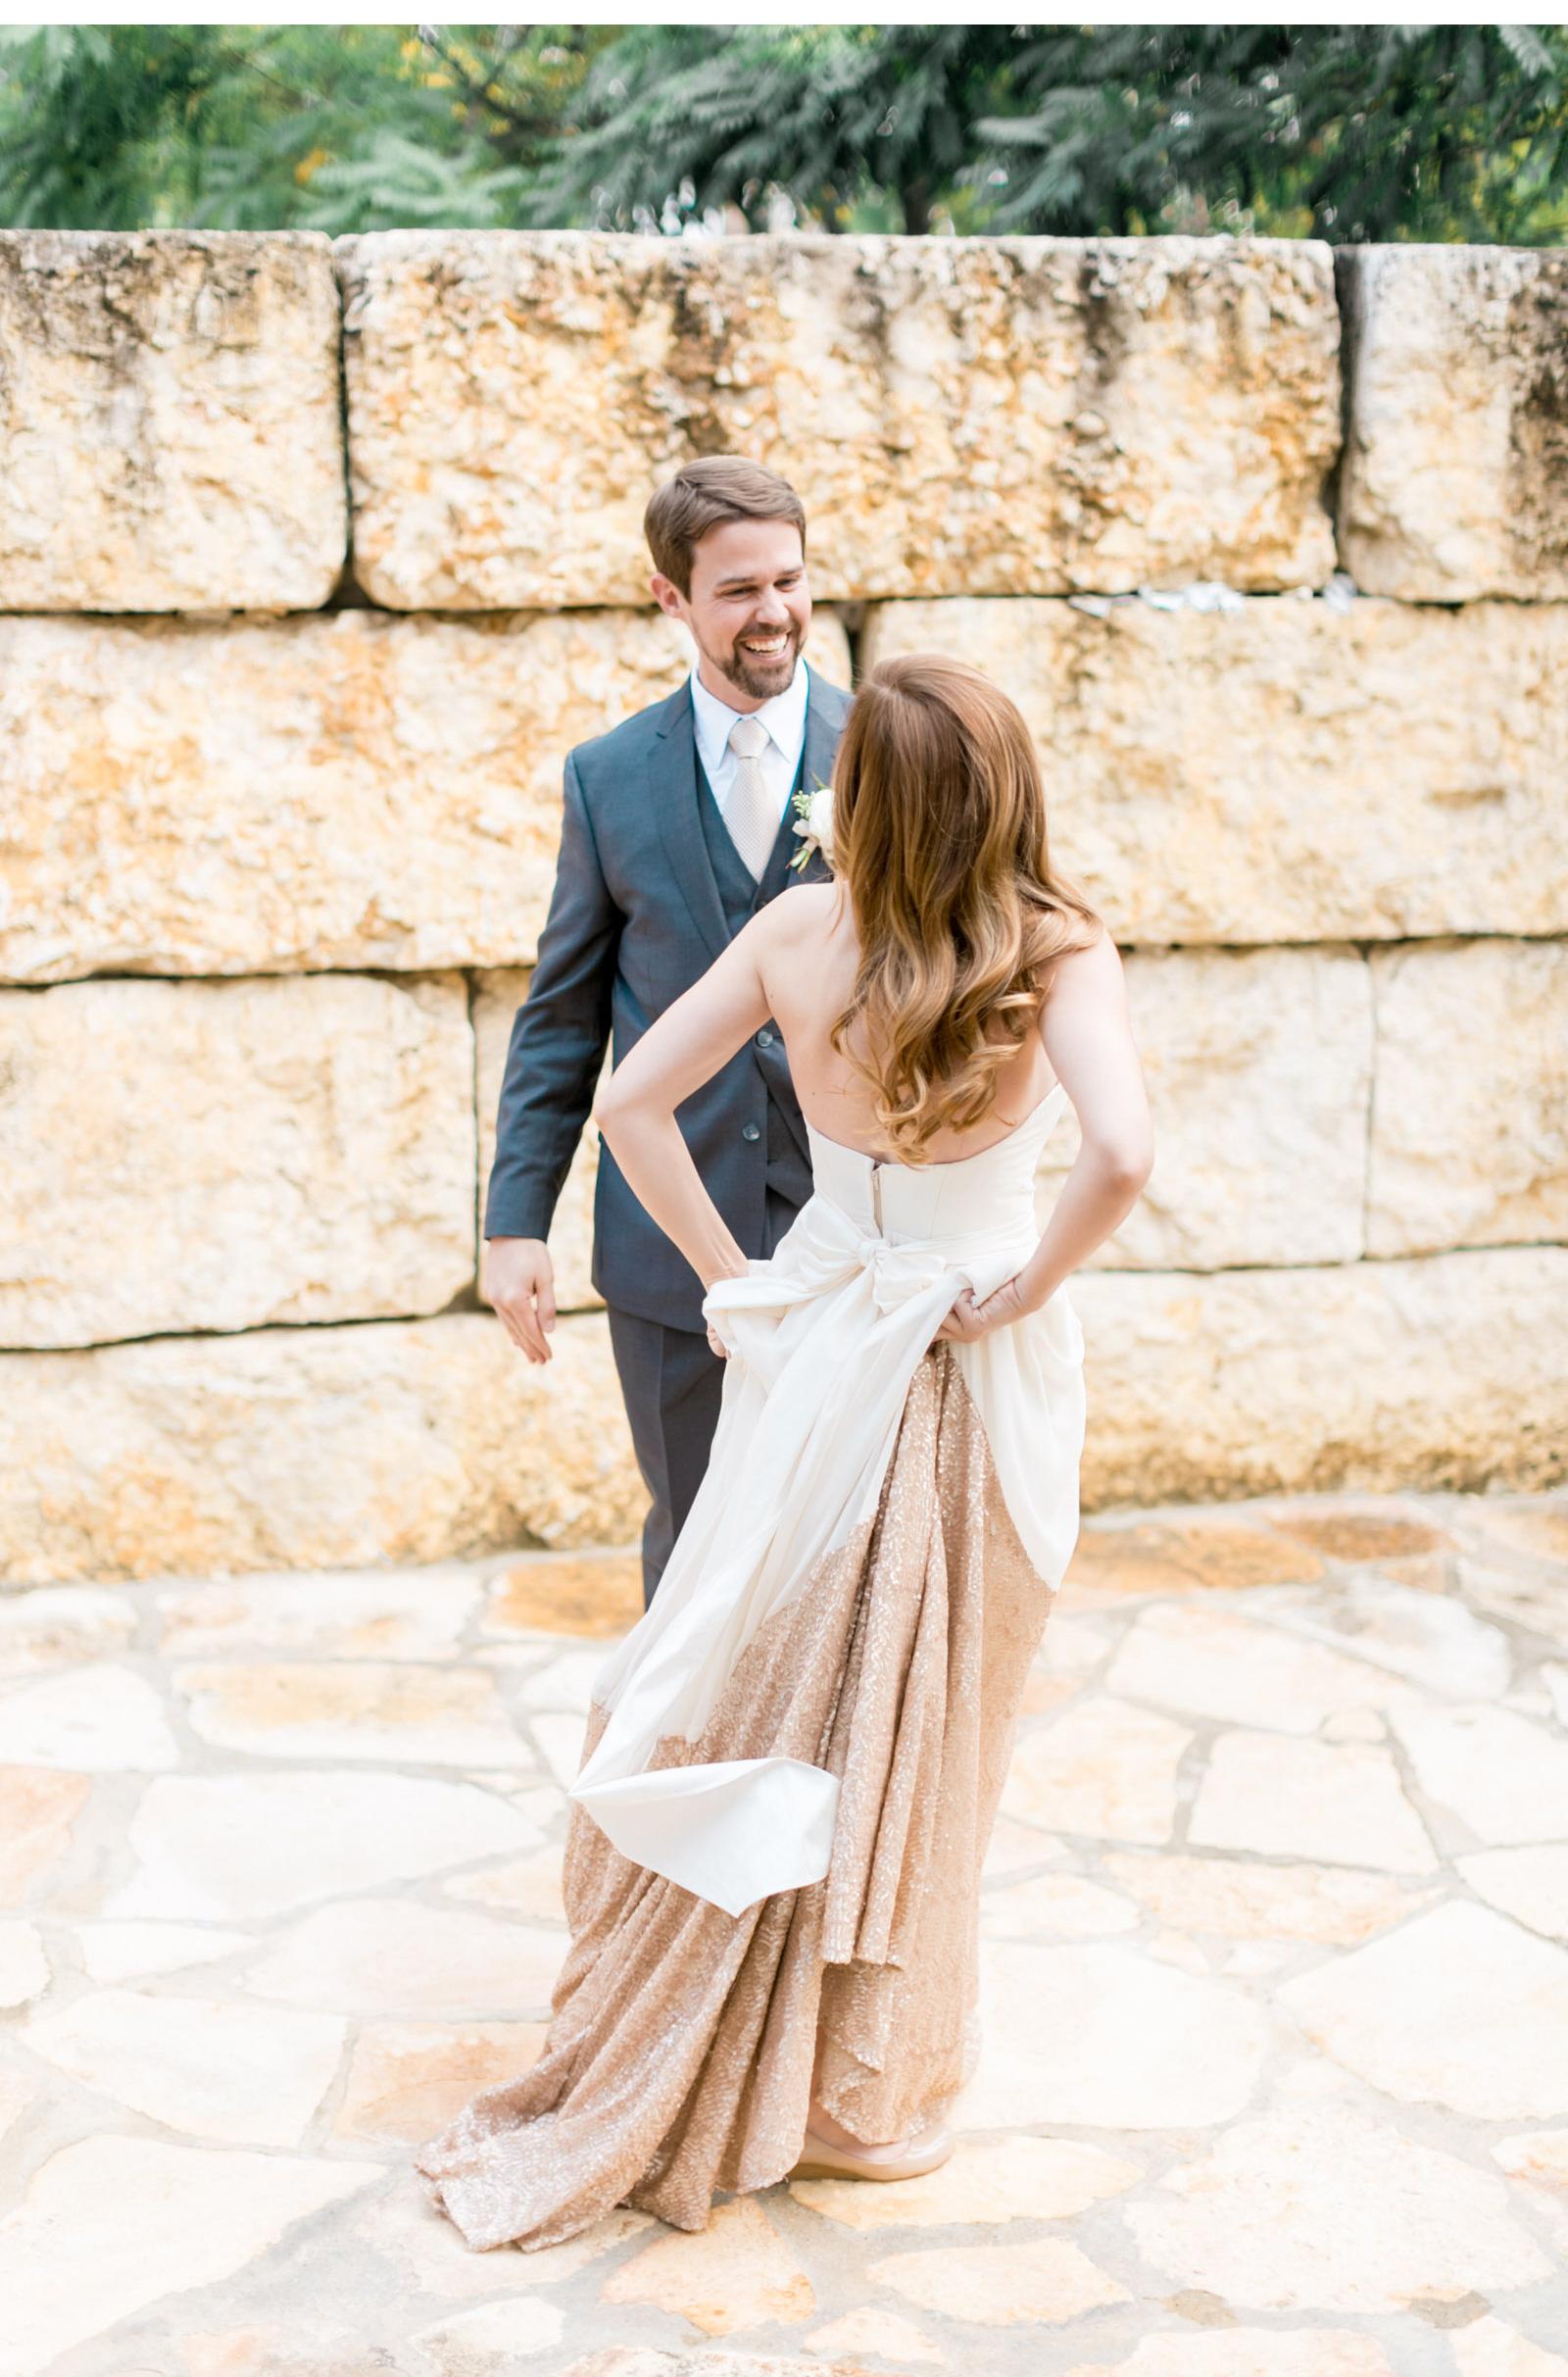 San-Luis-Obispo-Natalie-Schutt-Wedding-Photography_01.jpg